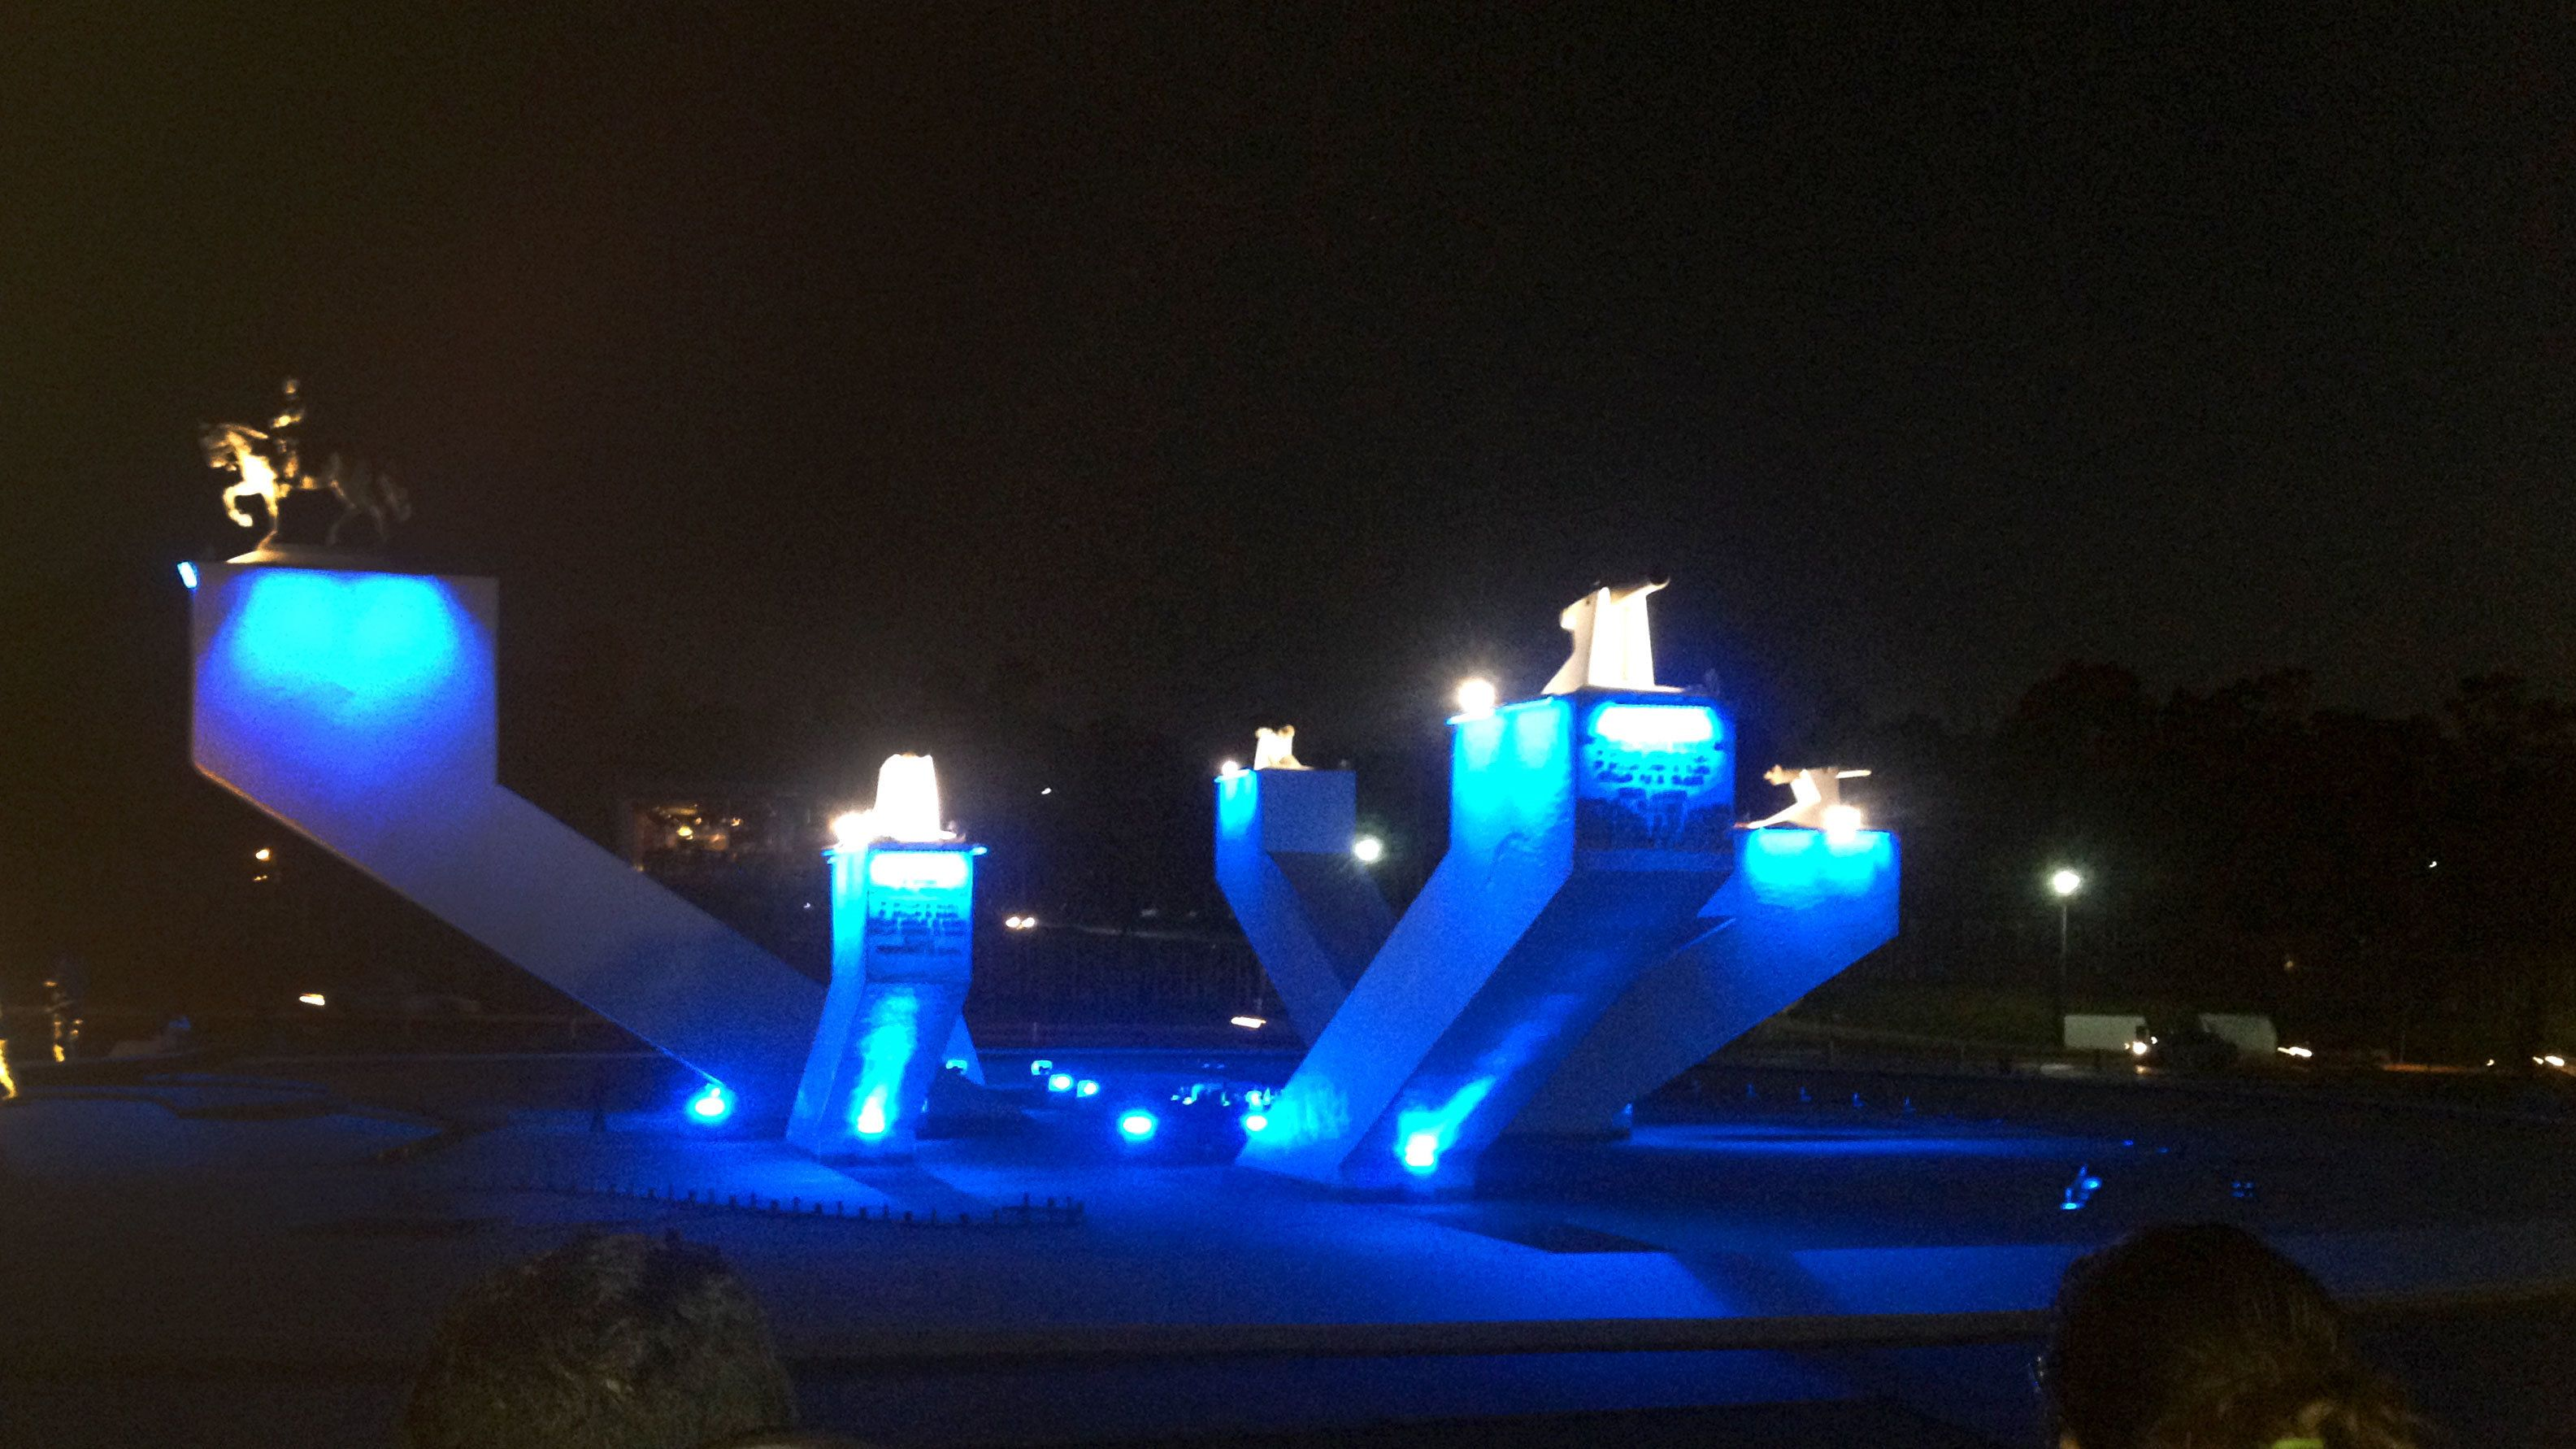 Large artwork in park at night in Puebla